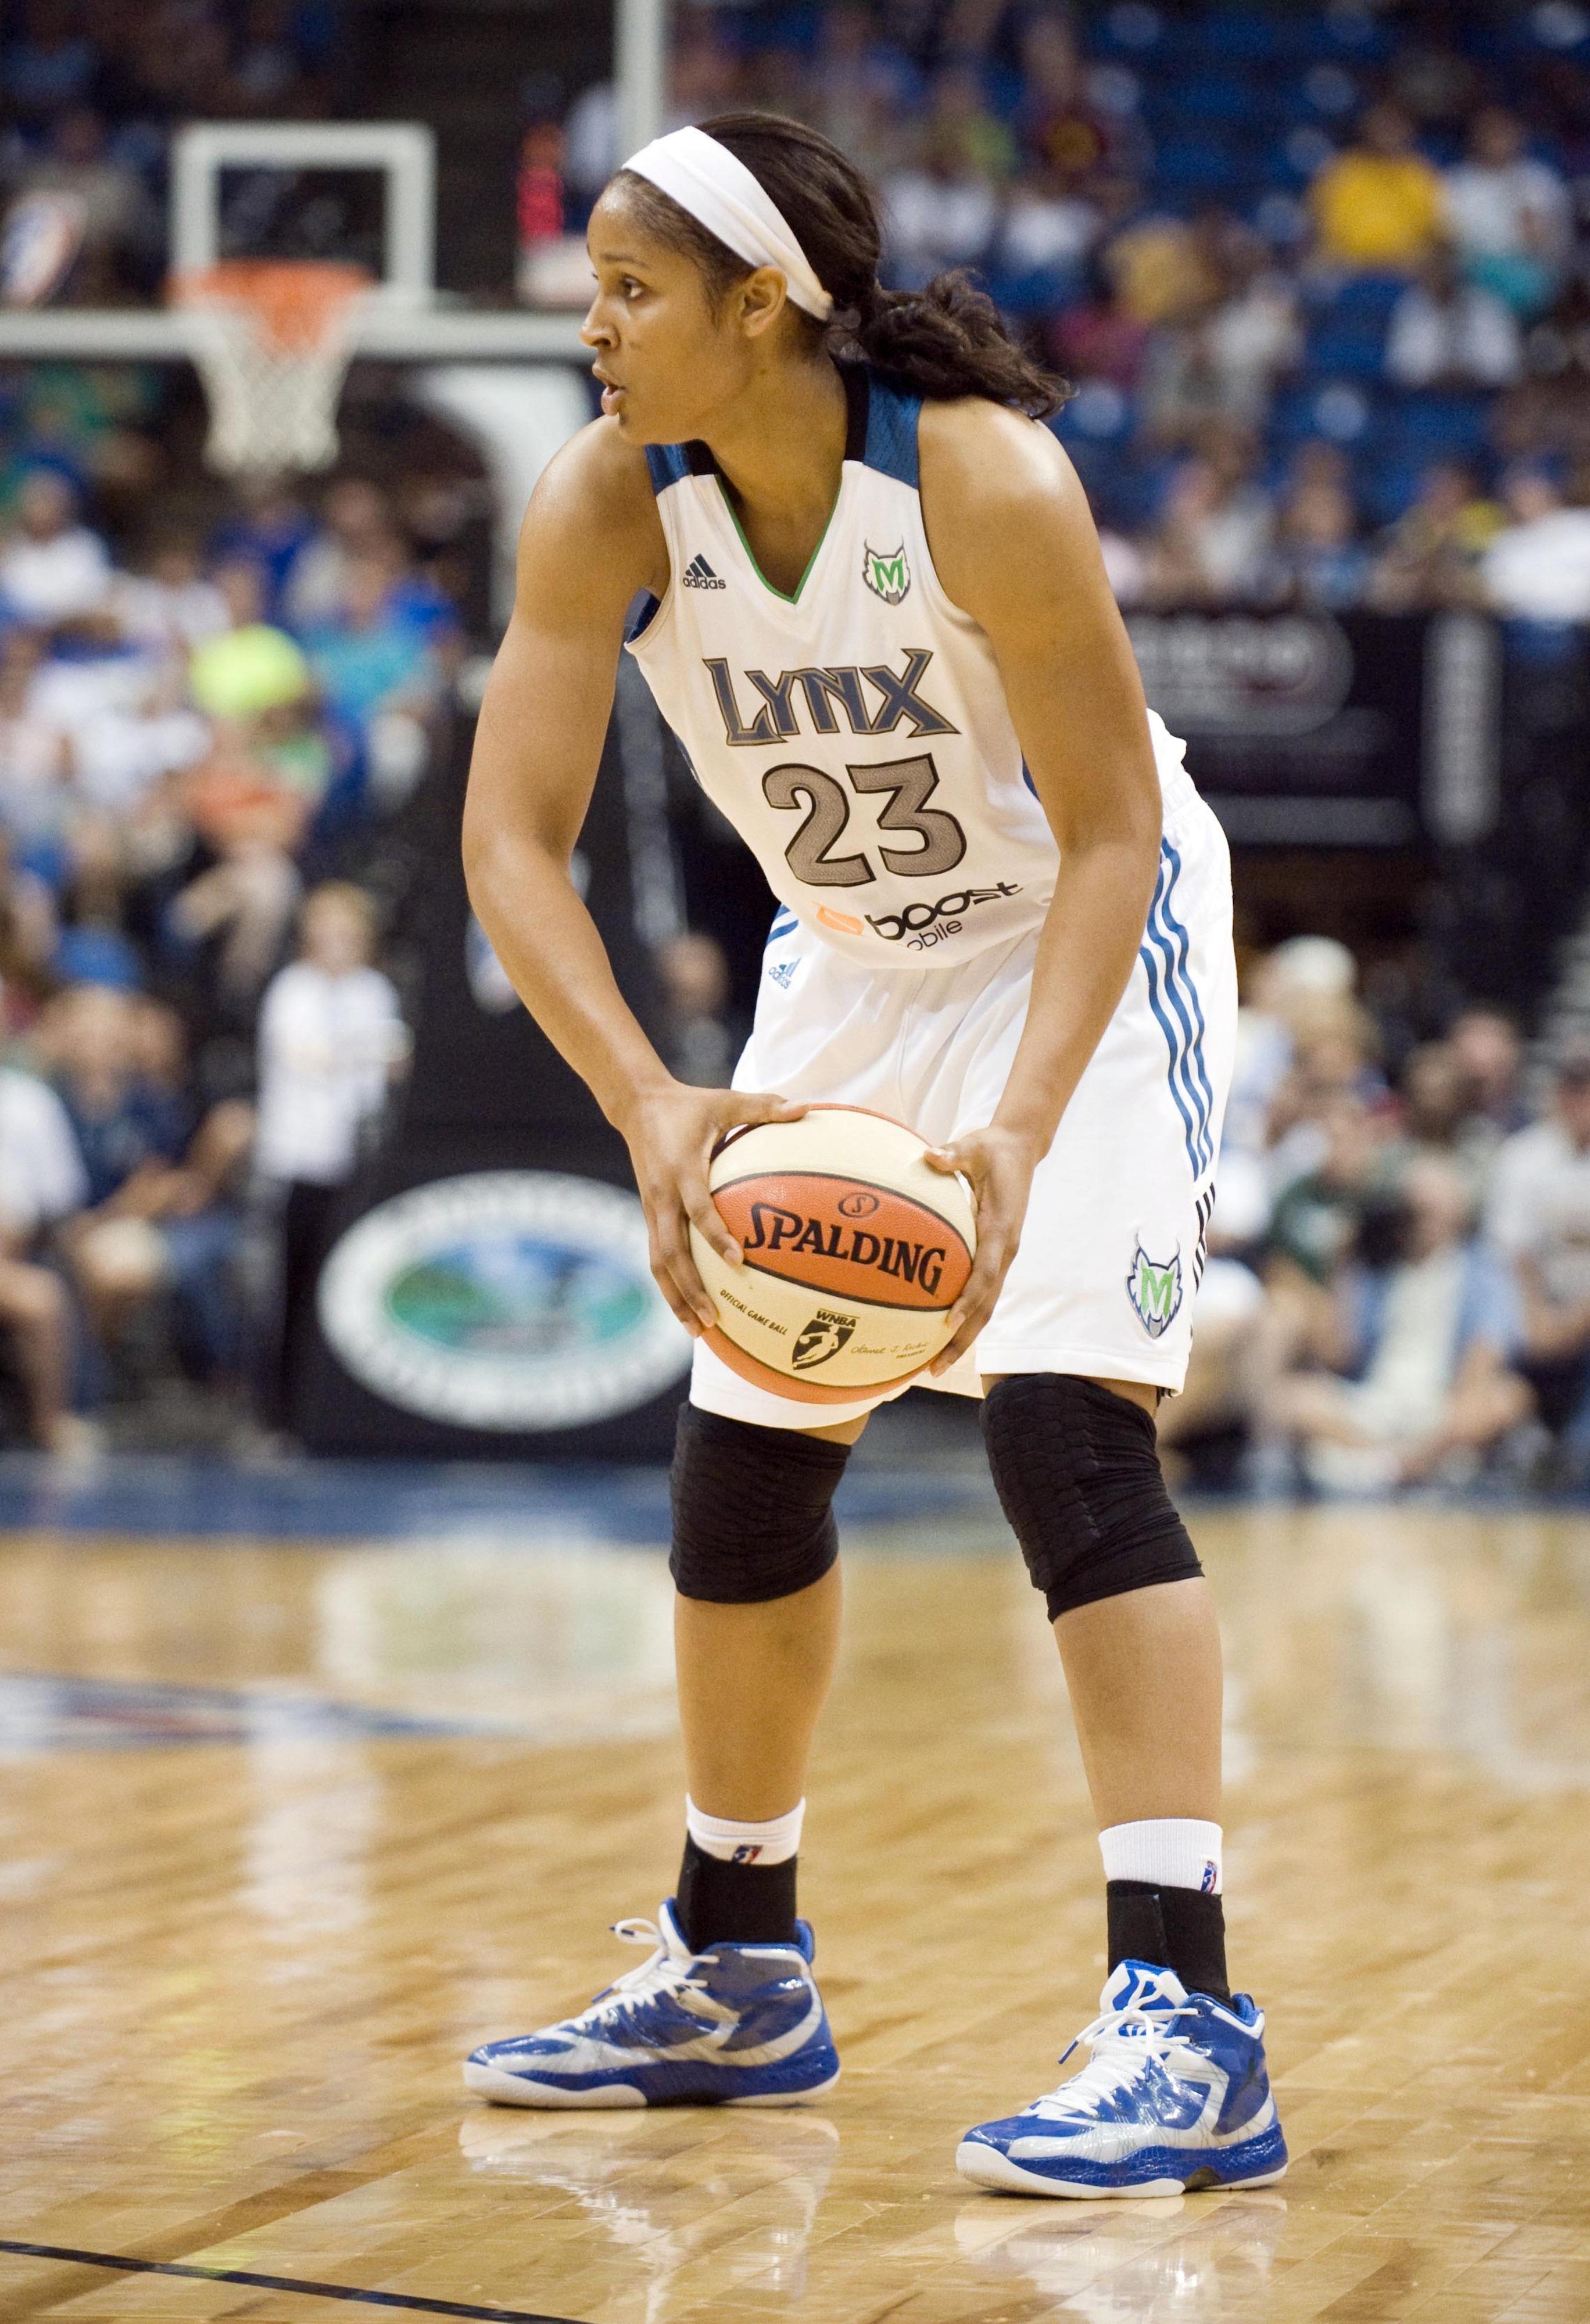 AUG 17, 2012; Minneapolis, MN, USA:  Minnesota Lynx forward Maya Moore (23) in the third quarter against the Washington Mystics at Target Center.  The Lynx defeated the Mystics 98-69.  Mandatory Credit: Marilyn Indahl-US PRESSWIRE